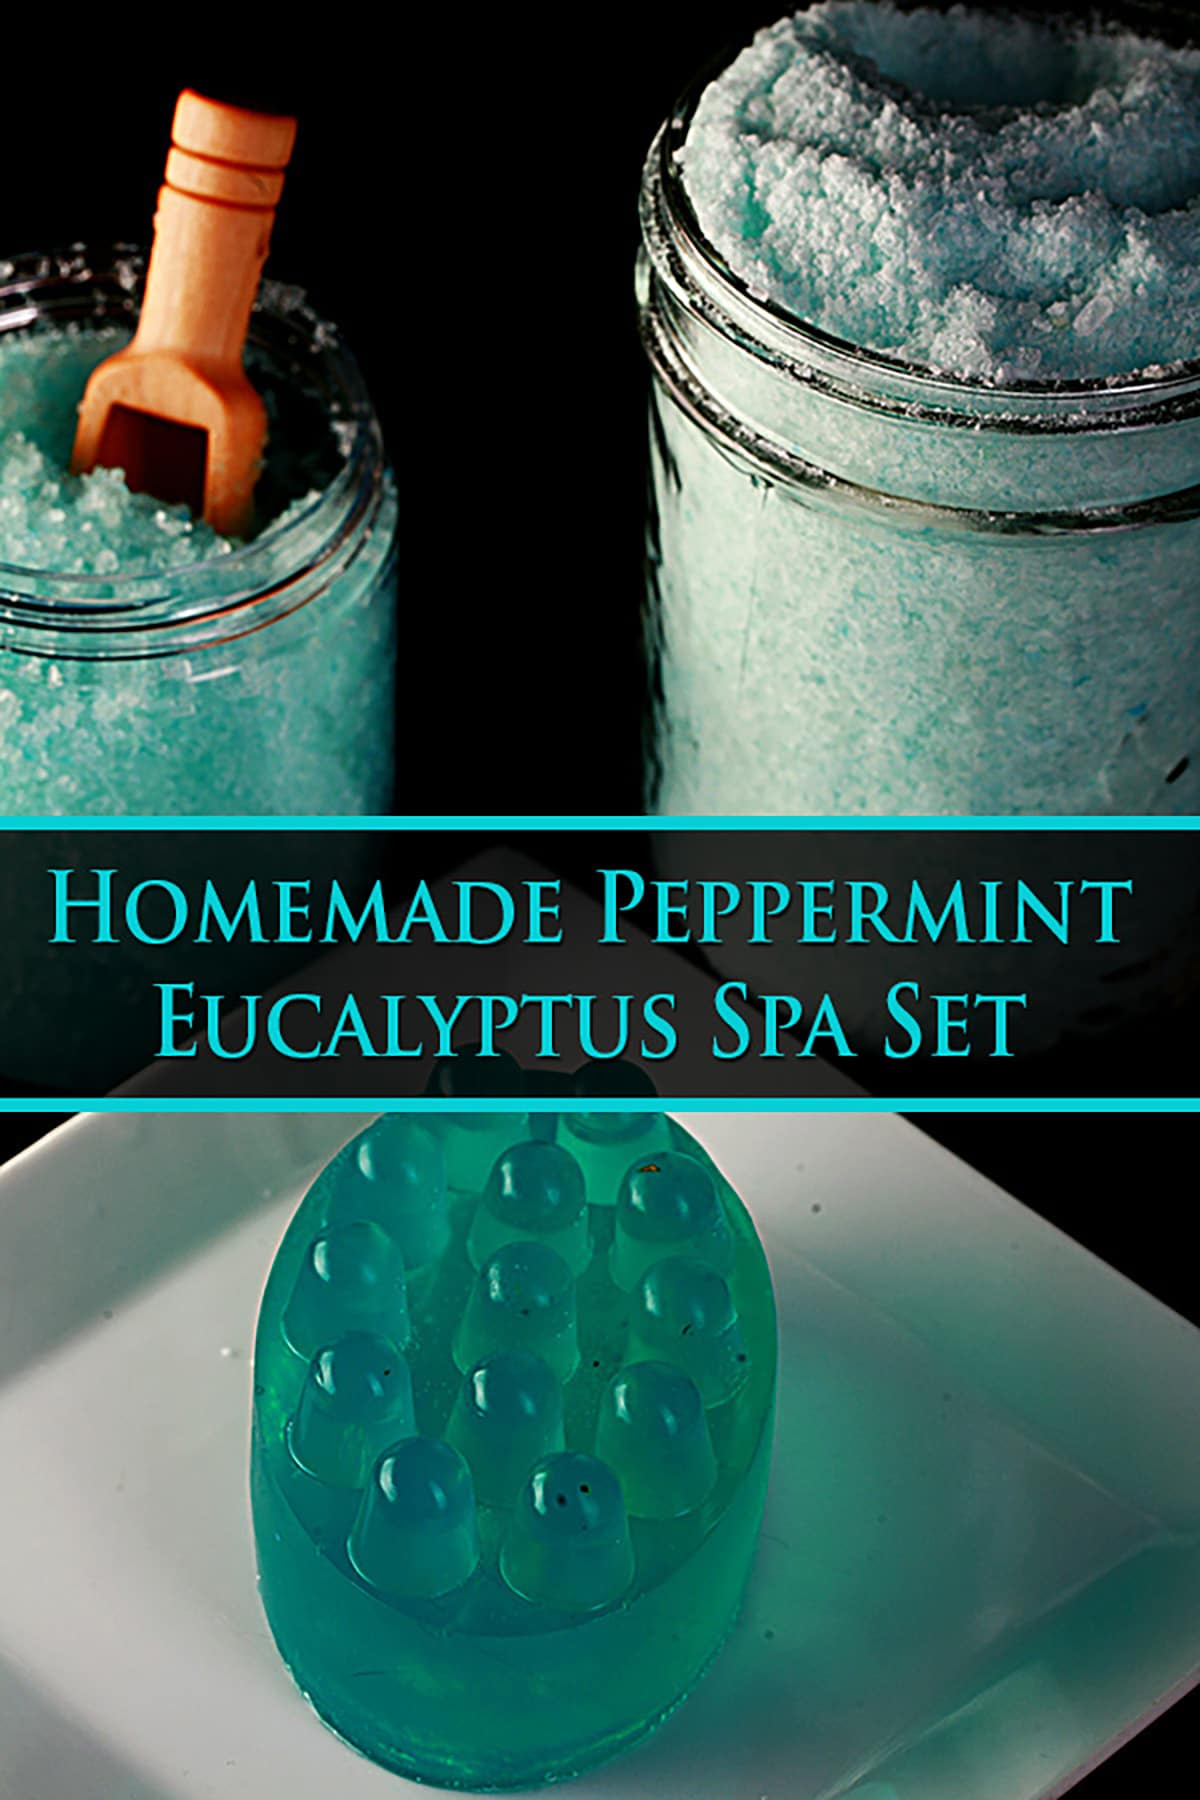 A three piece peppermint-eucalyptus bath set - bath salt, salt scrub, and a soap. Blue text says homemade peppermint eucalyptus spa set.